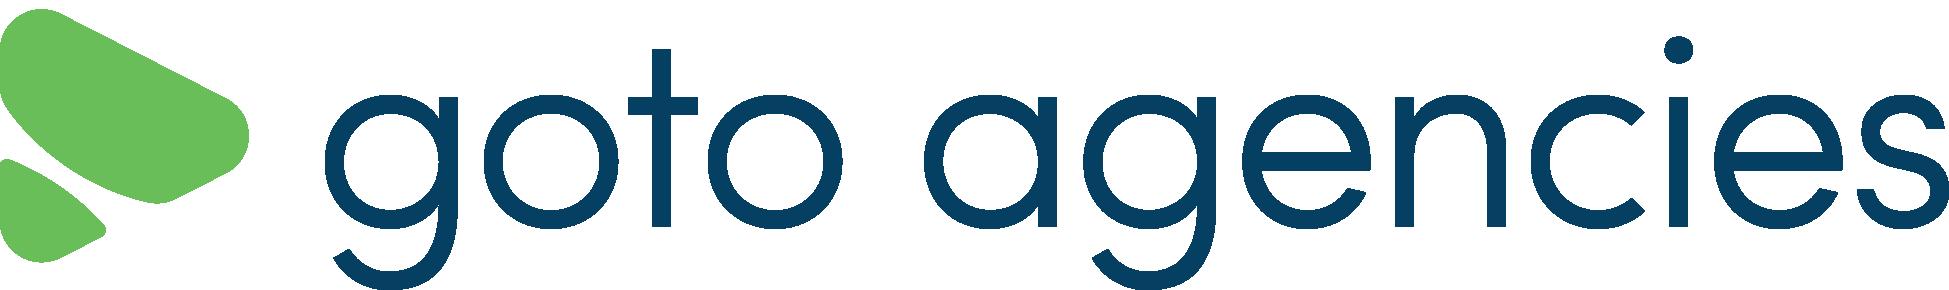 logo_gotoagencies